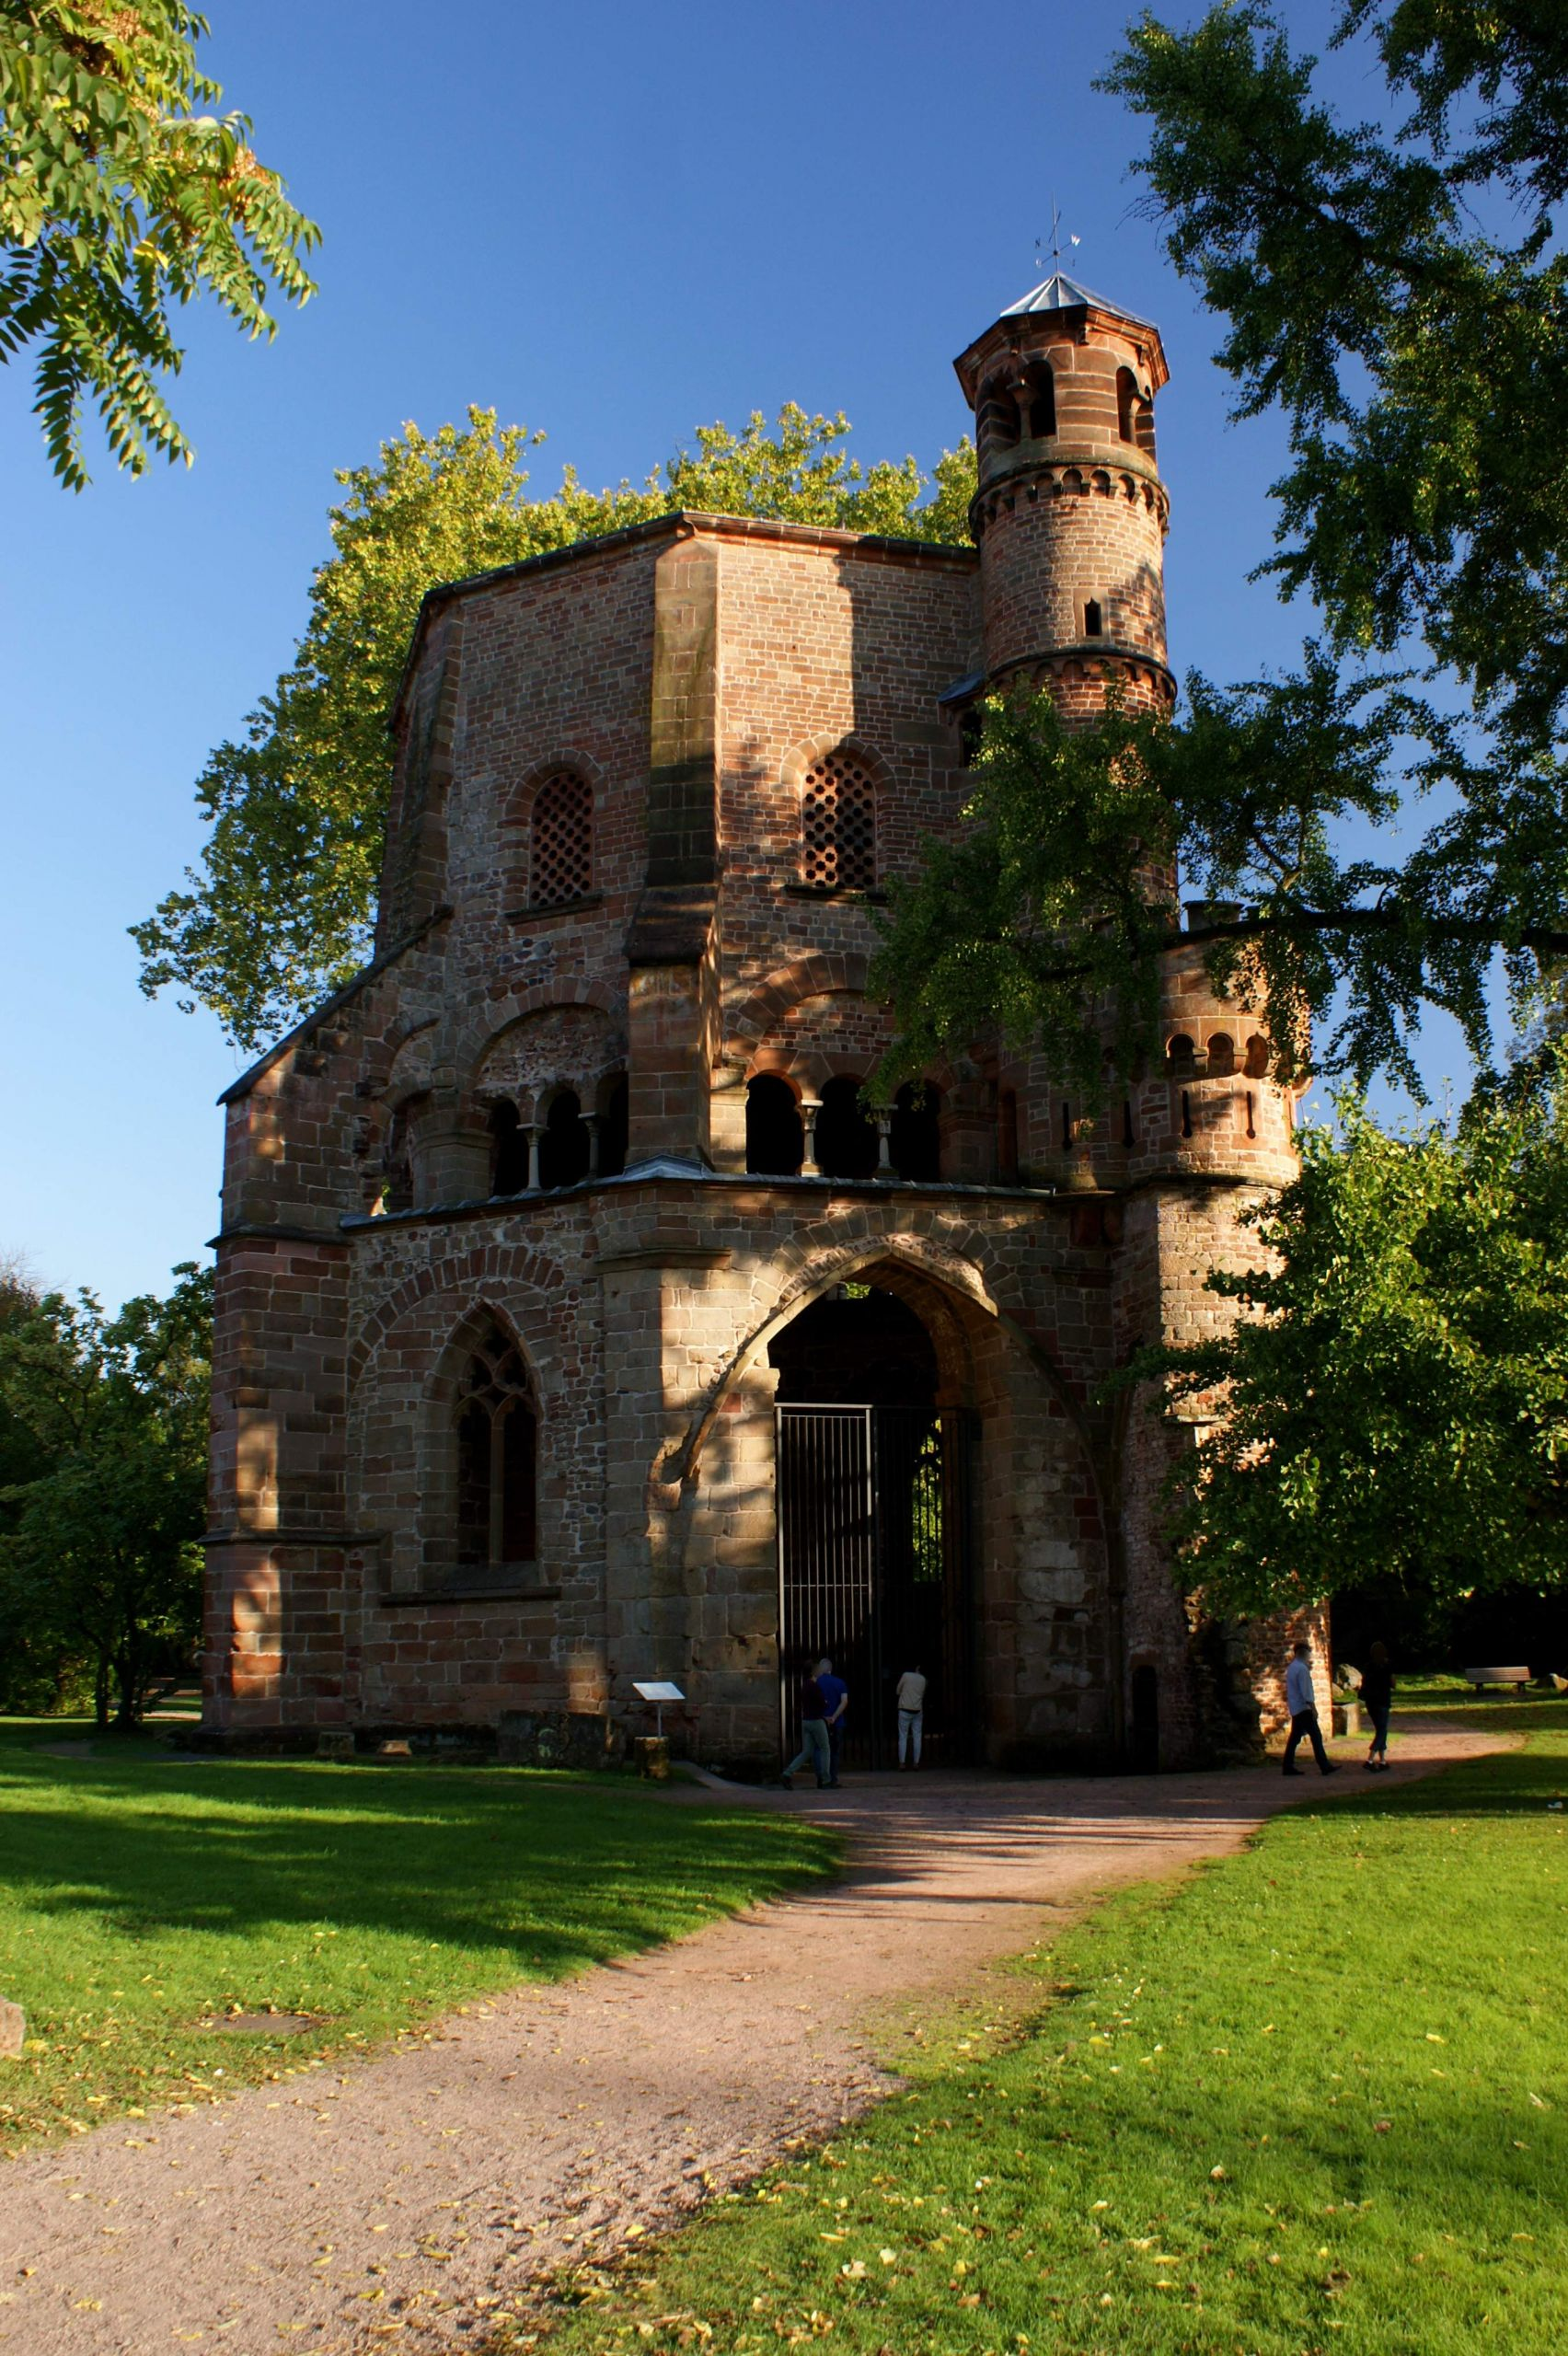 Alter Turm Mettlach pol